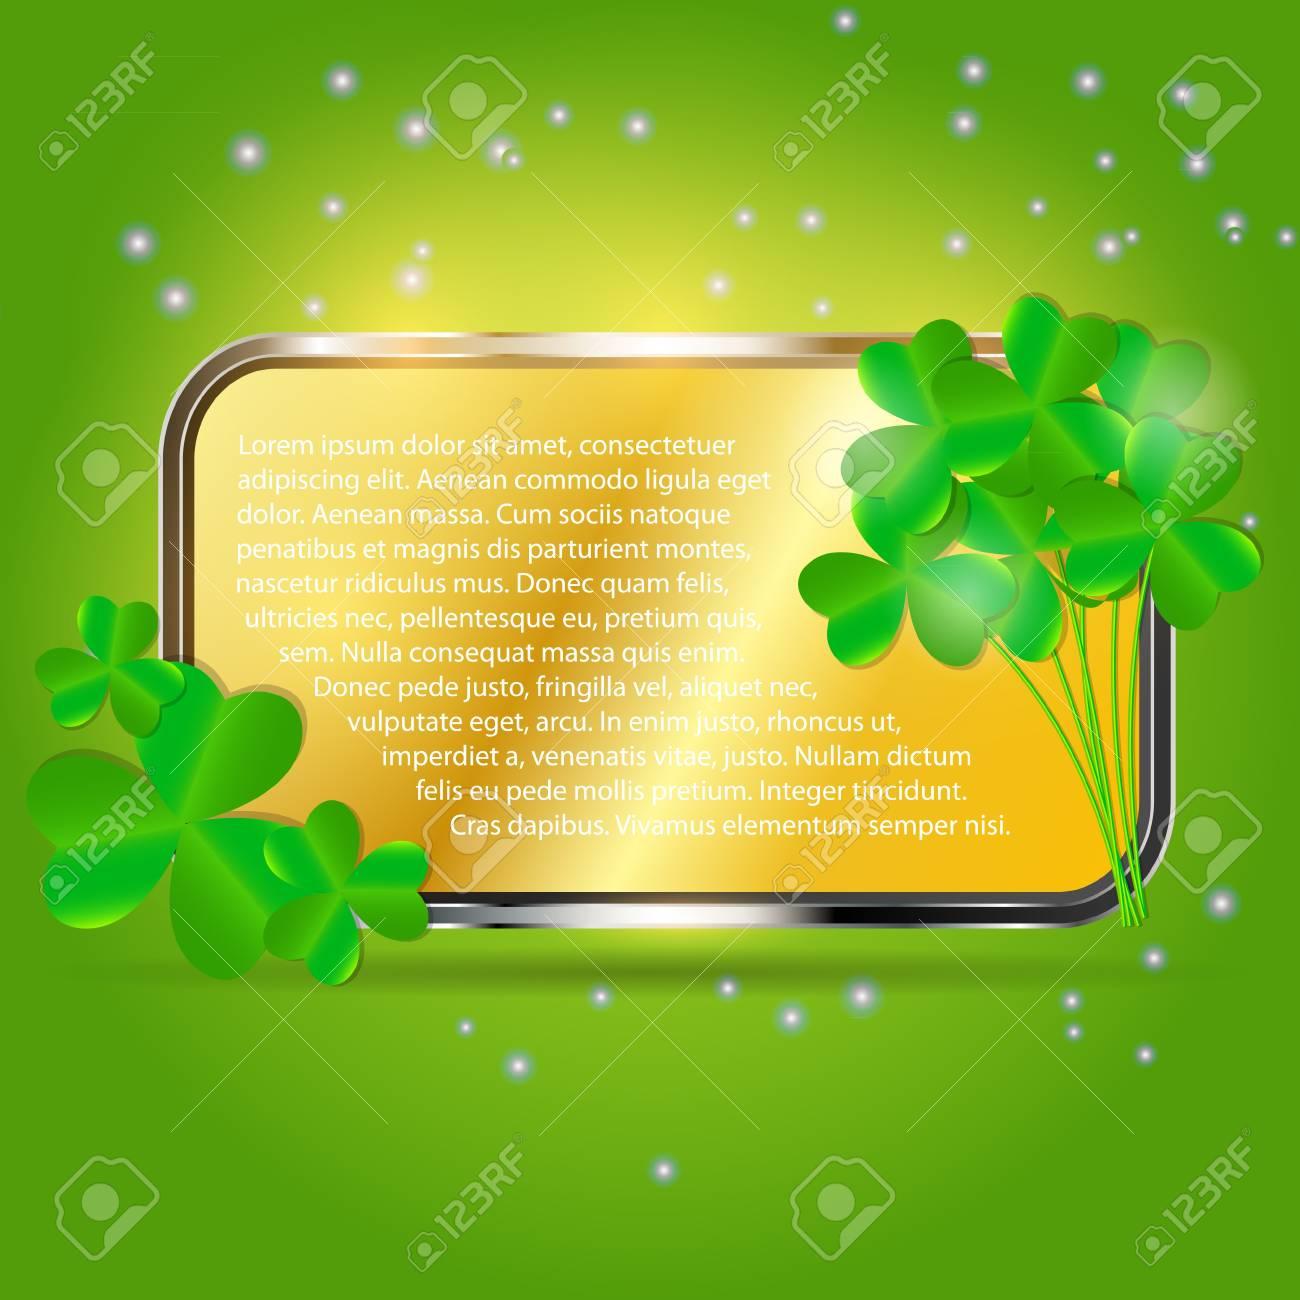 Saint Patrick s day background vector illustration Stock Illustration - 17248792